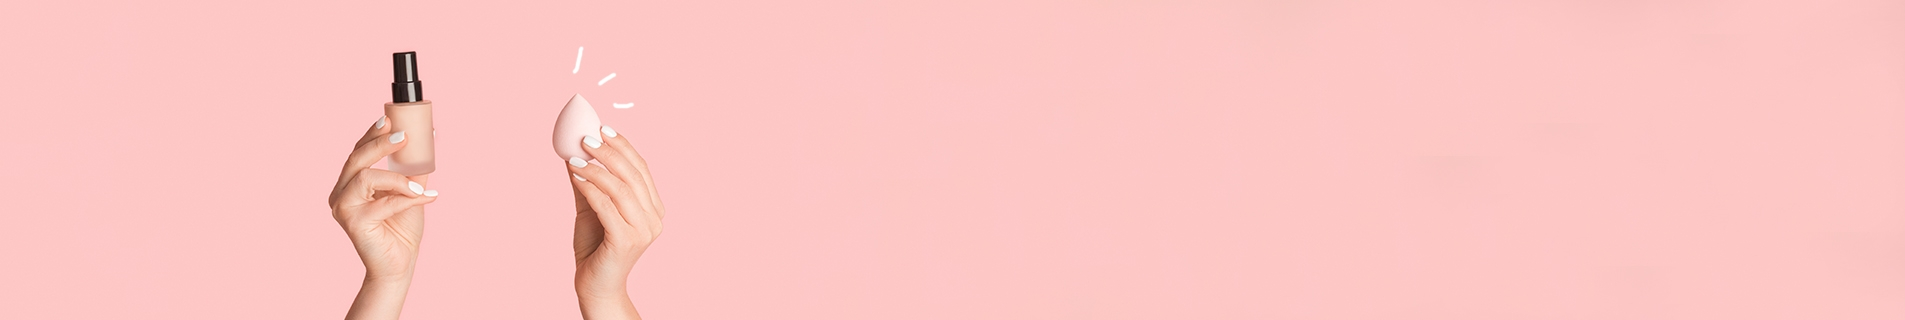 Gloss à lèvrespas cher | Site de maquillage | SAGA Cosmetics